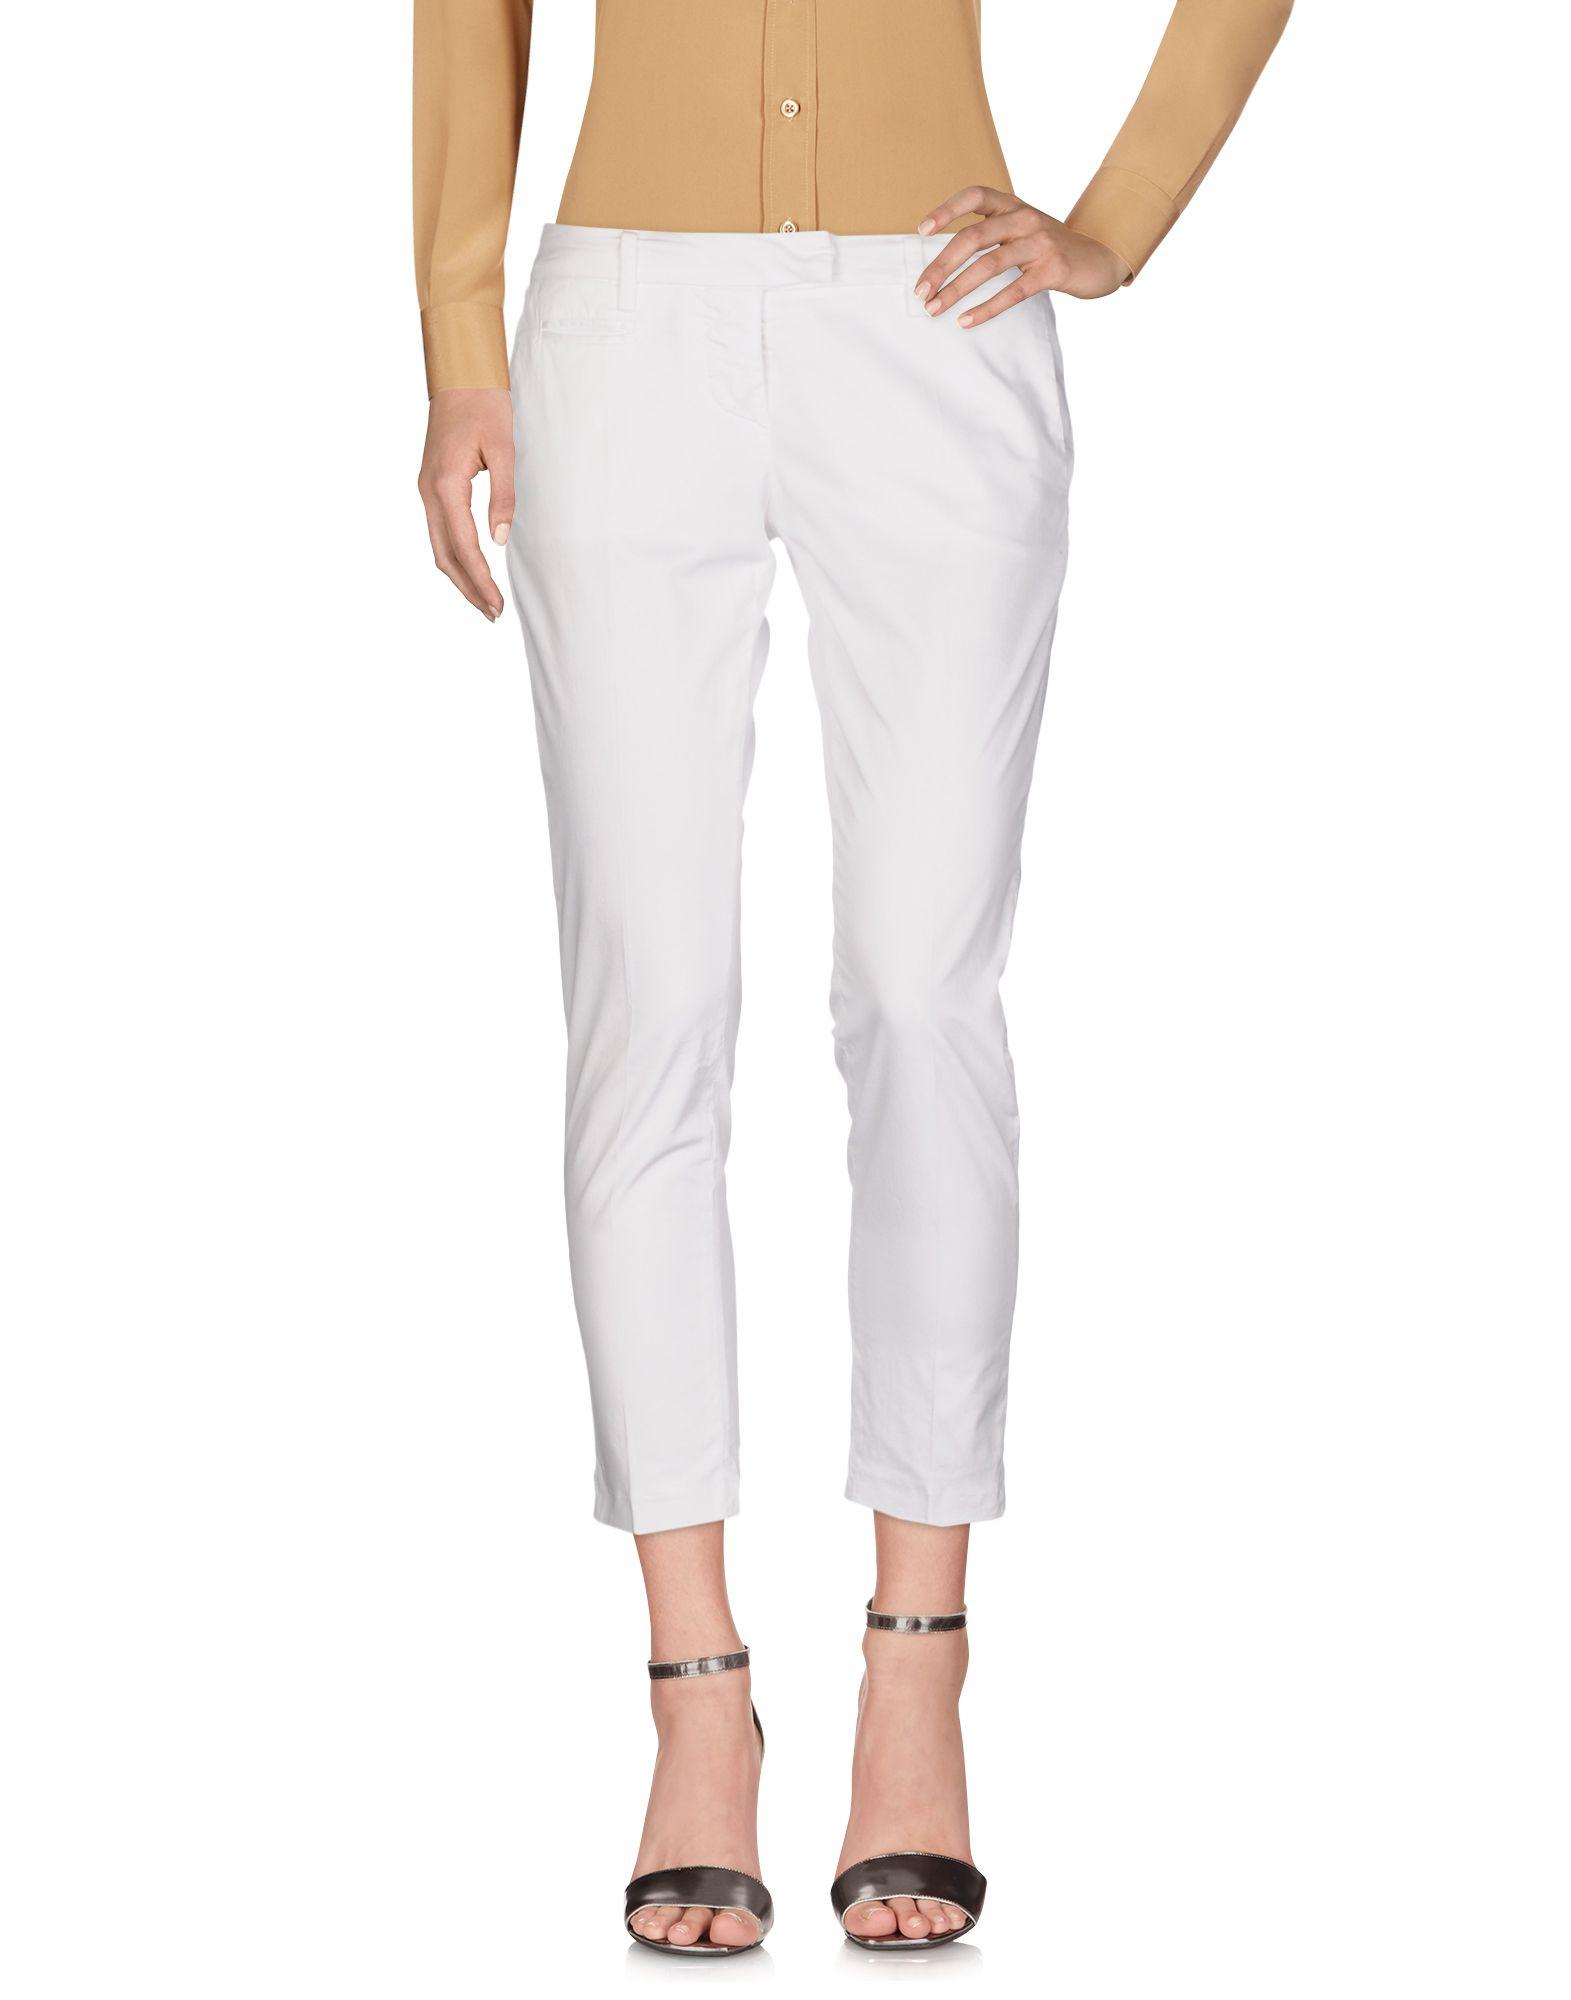 Pantalone Dondup Donna - Acquista online su JfdO6xJX